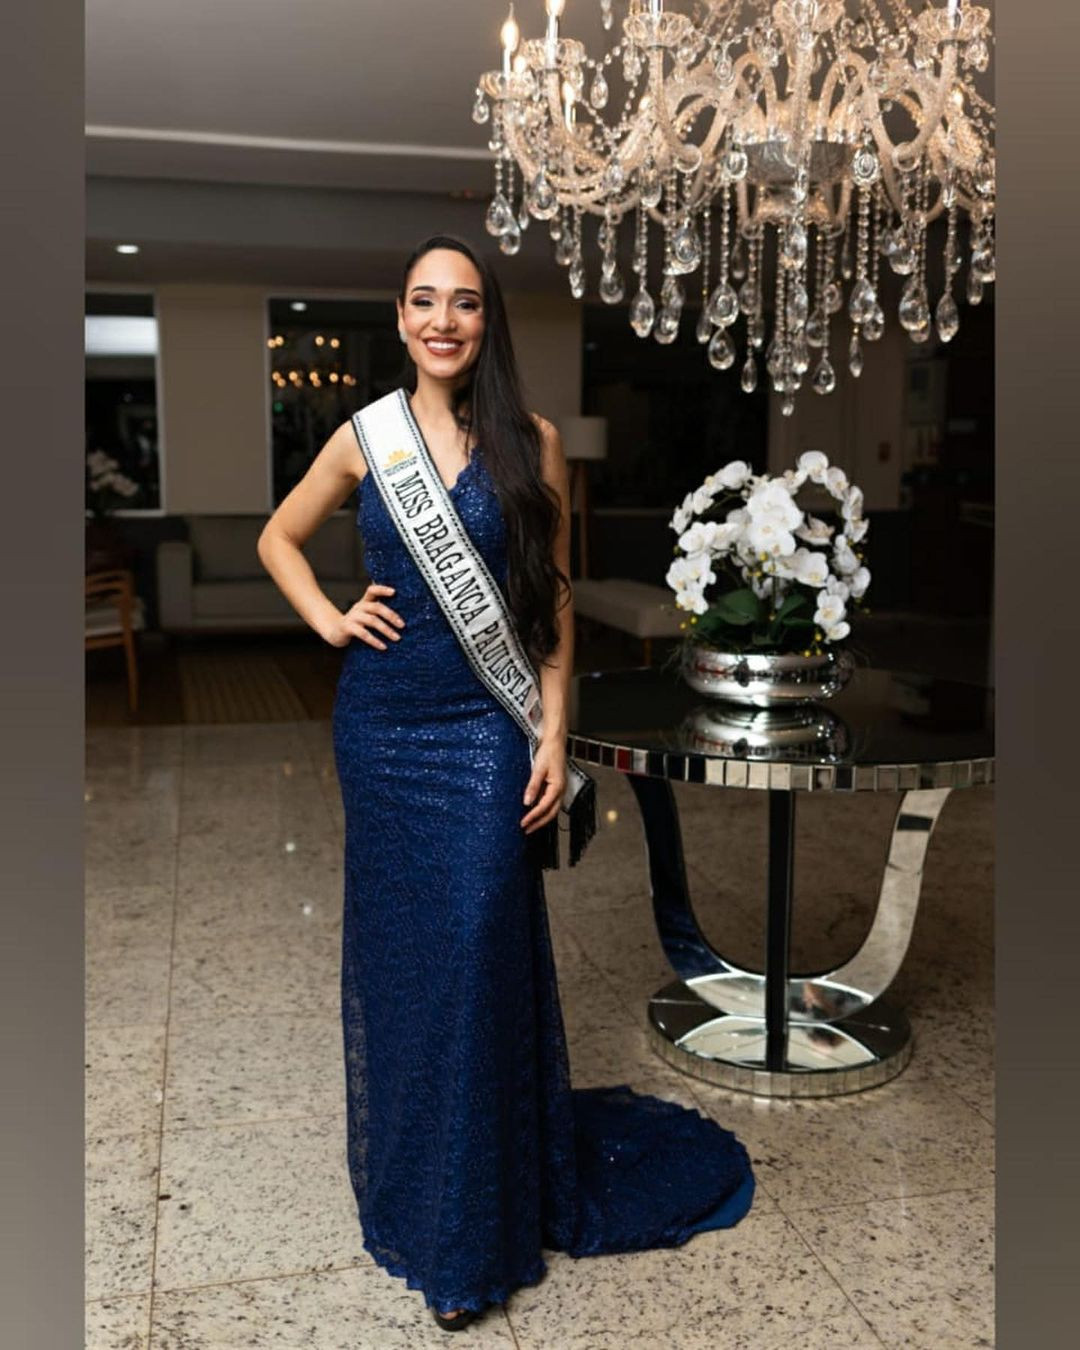 candidatas a miss sao paulo mundo 2022. BZpvWl